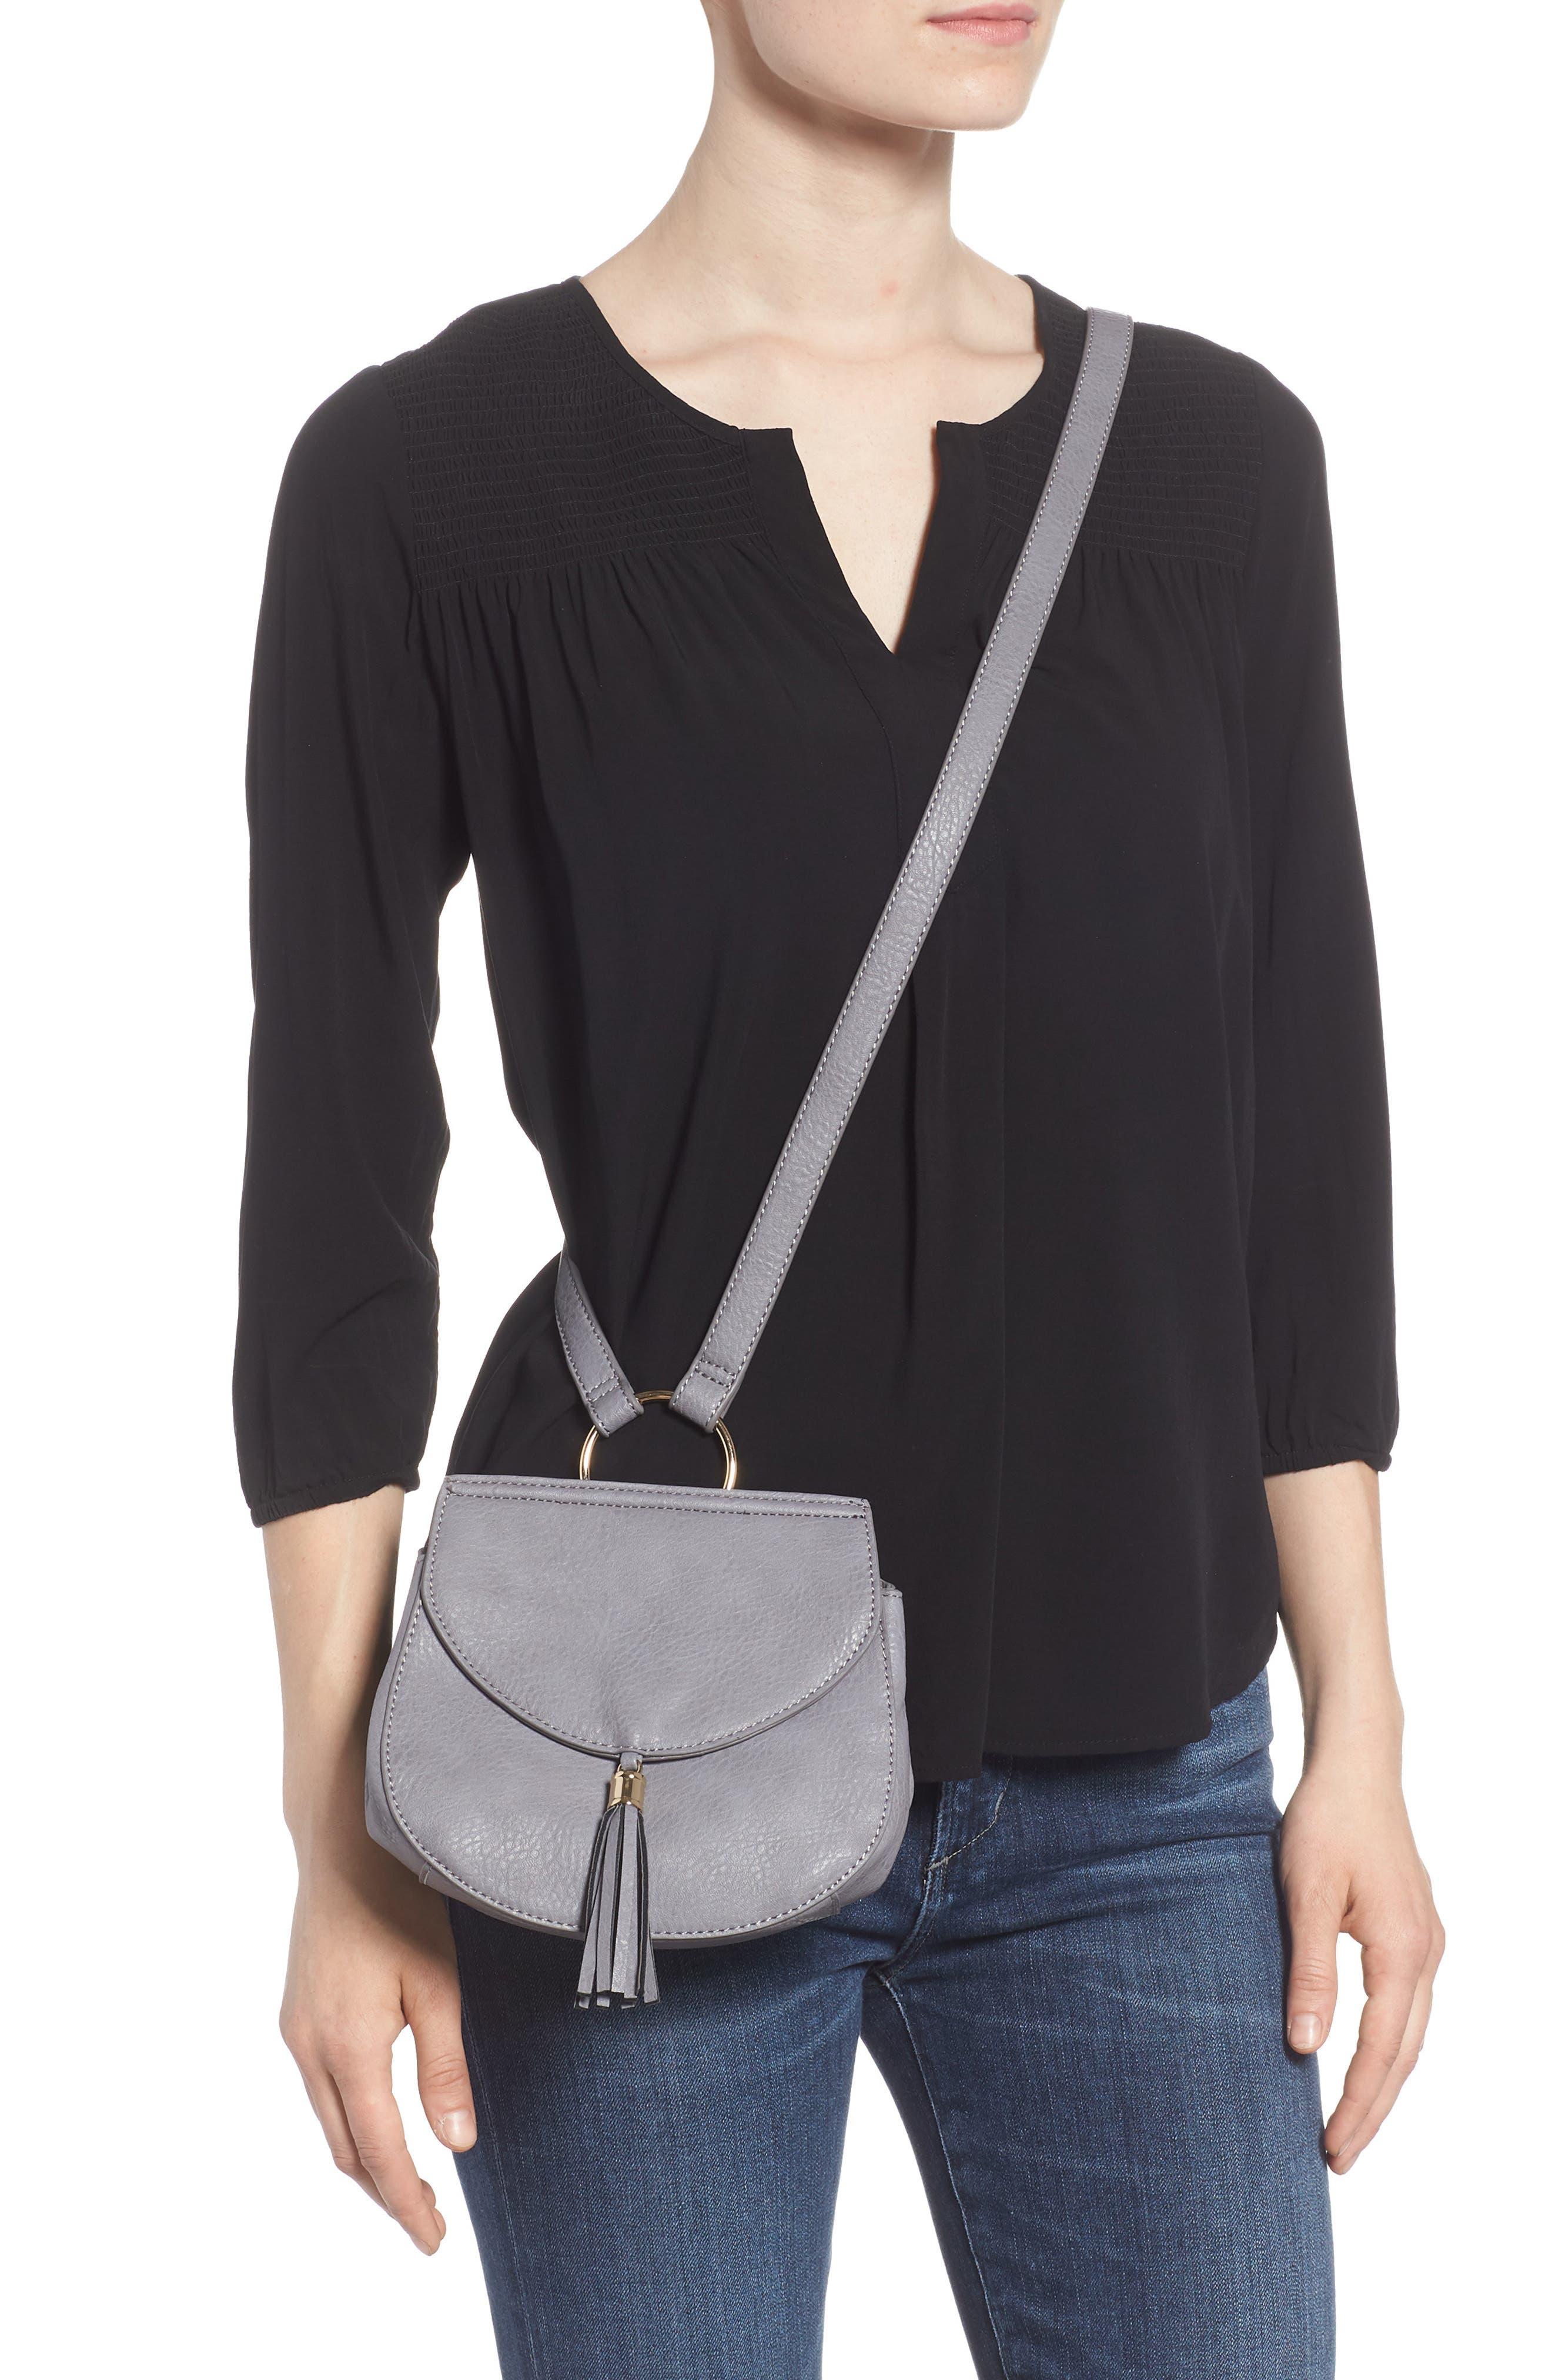 Tassel Faux Leather Crossbody Saddle Bag,                             Alternate thumbnail 2, color,                             Grey